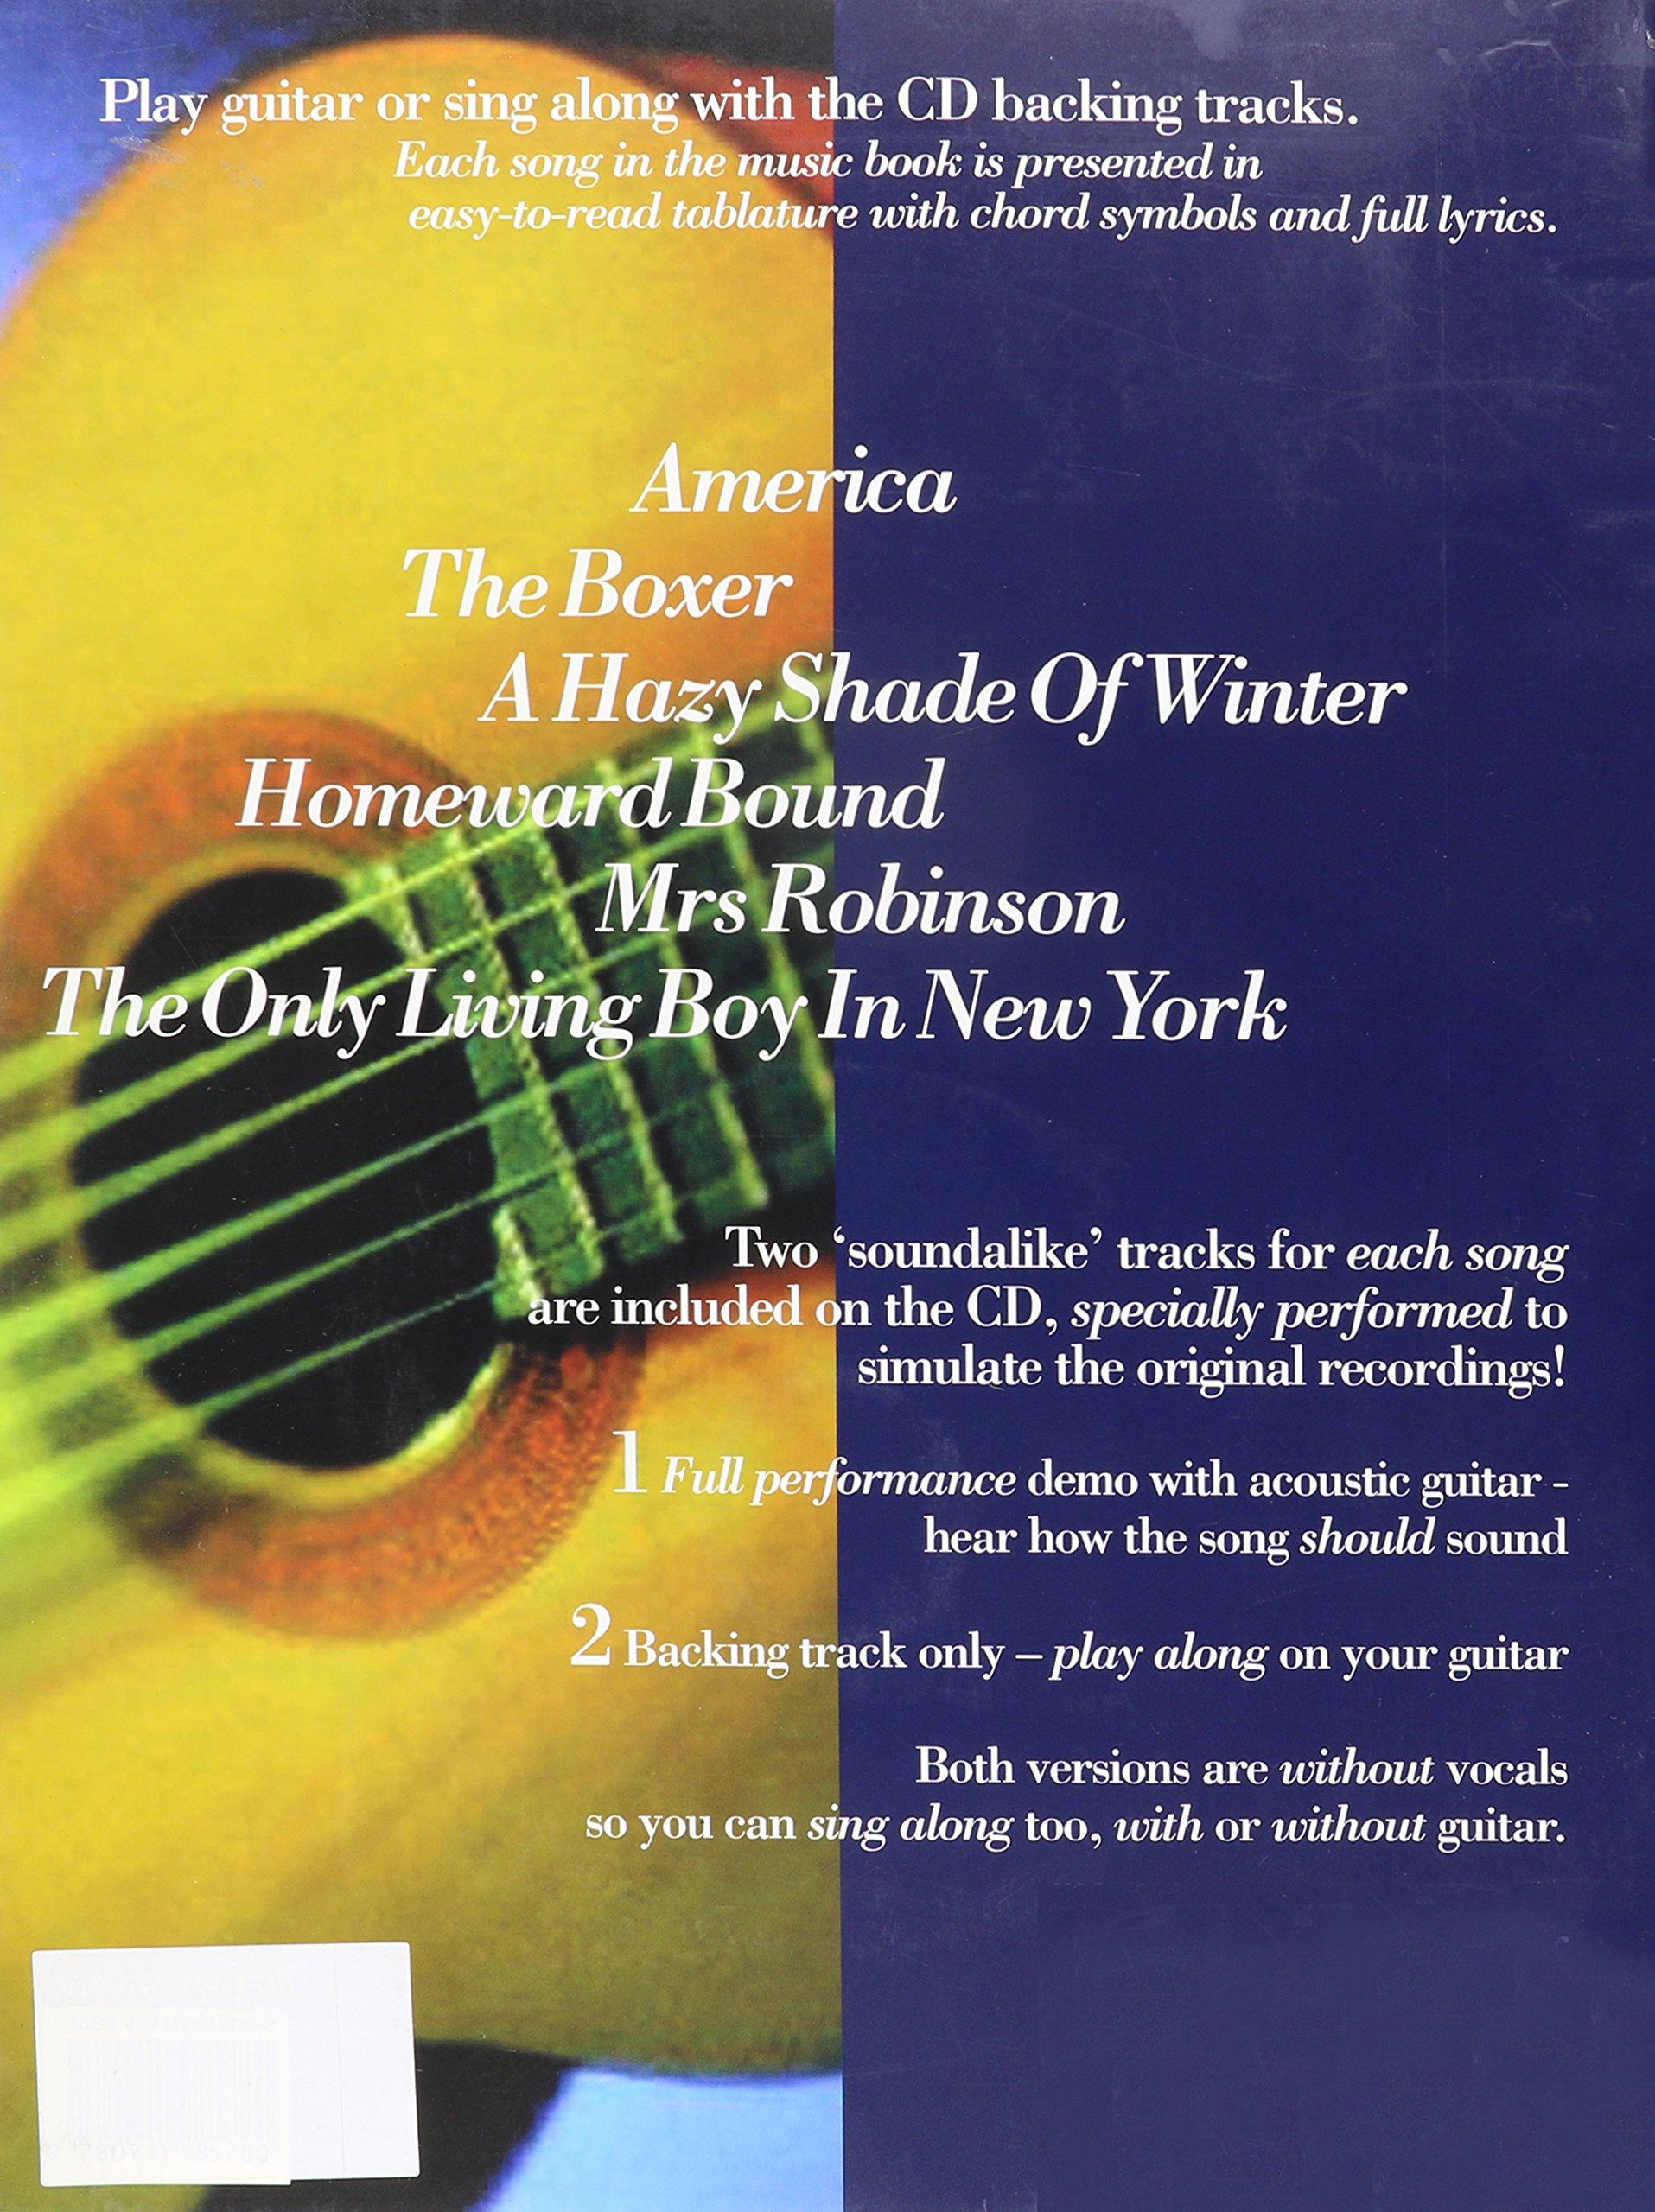 Amazon Hal Leonard Play Acoustic Guitar With Simon Garfunkel